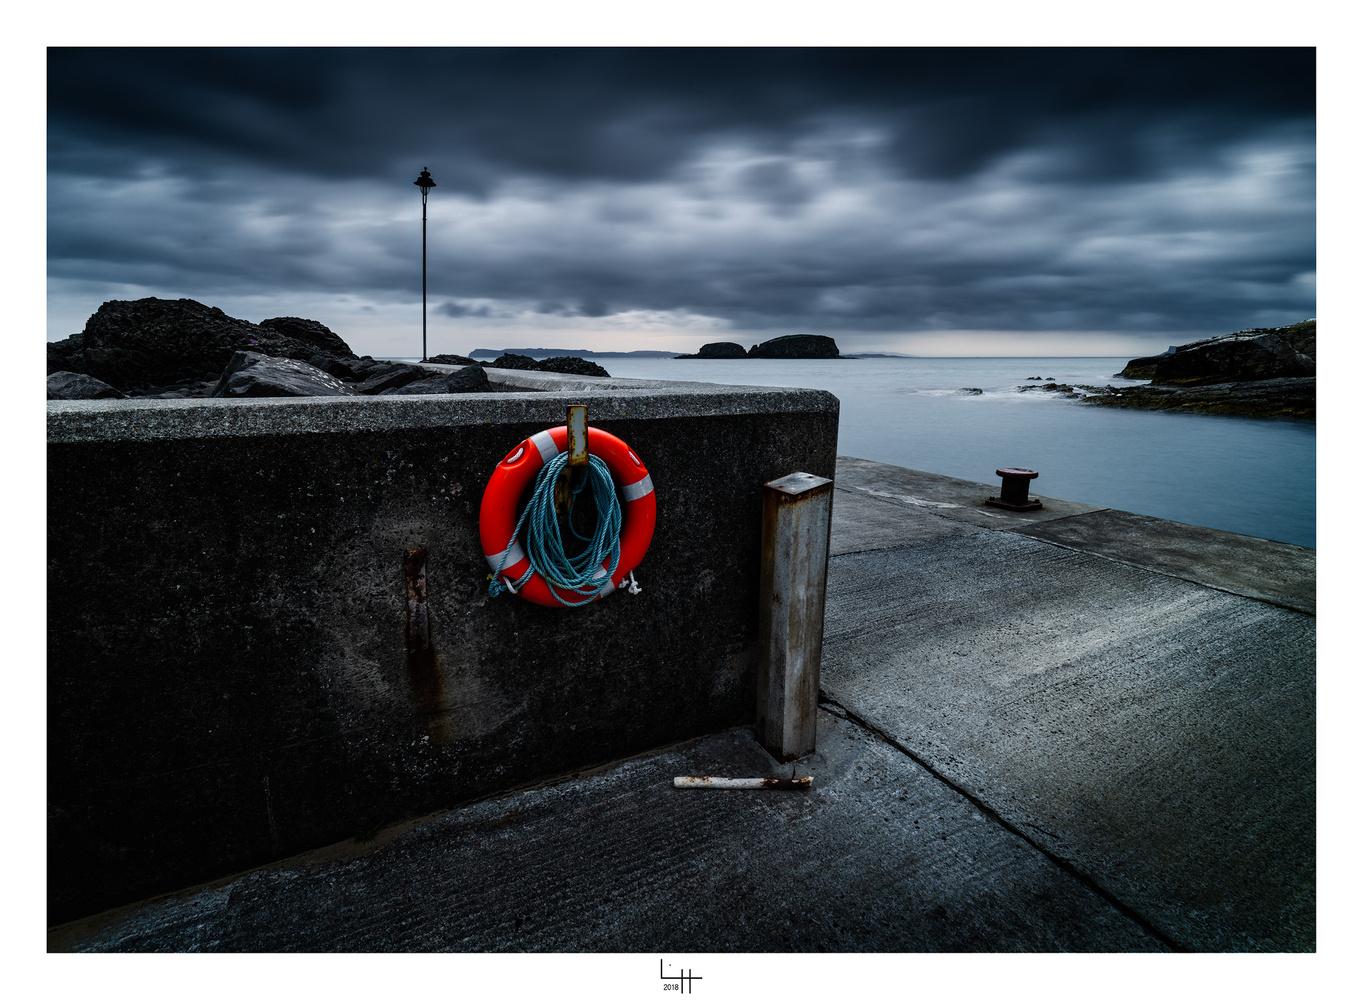 La Bouée, Ballintoy, Co Antrim, Irlande du Nord by Lionel HUG